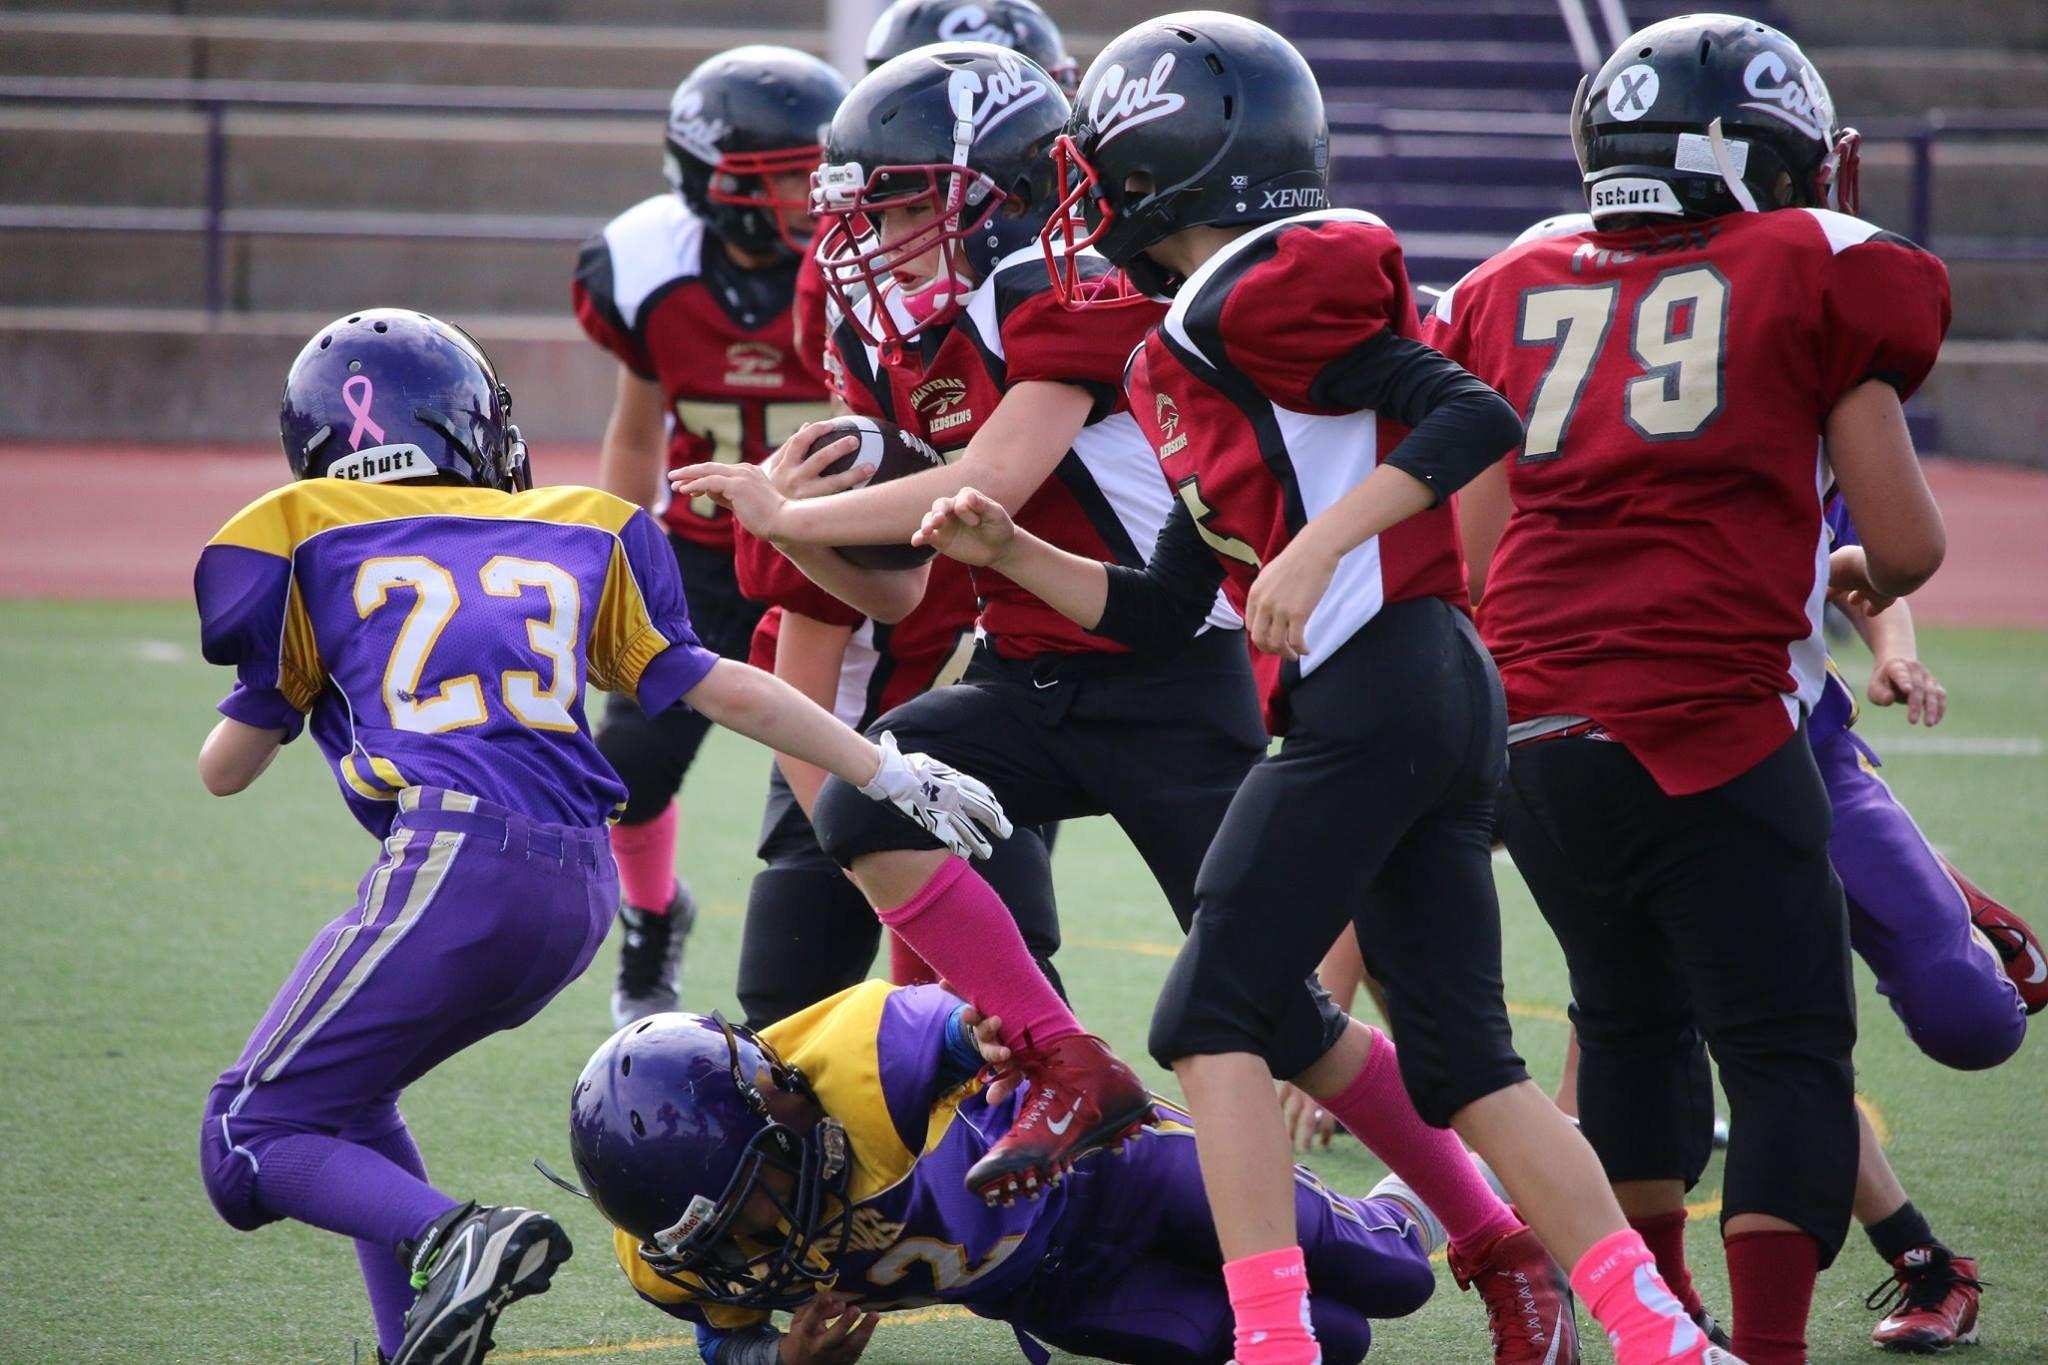 Calaveras Junior Redskins Youth Football And Cheer Program